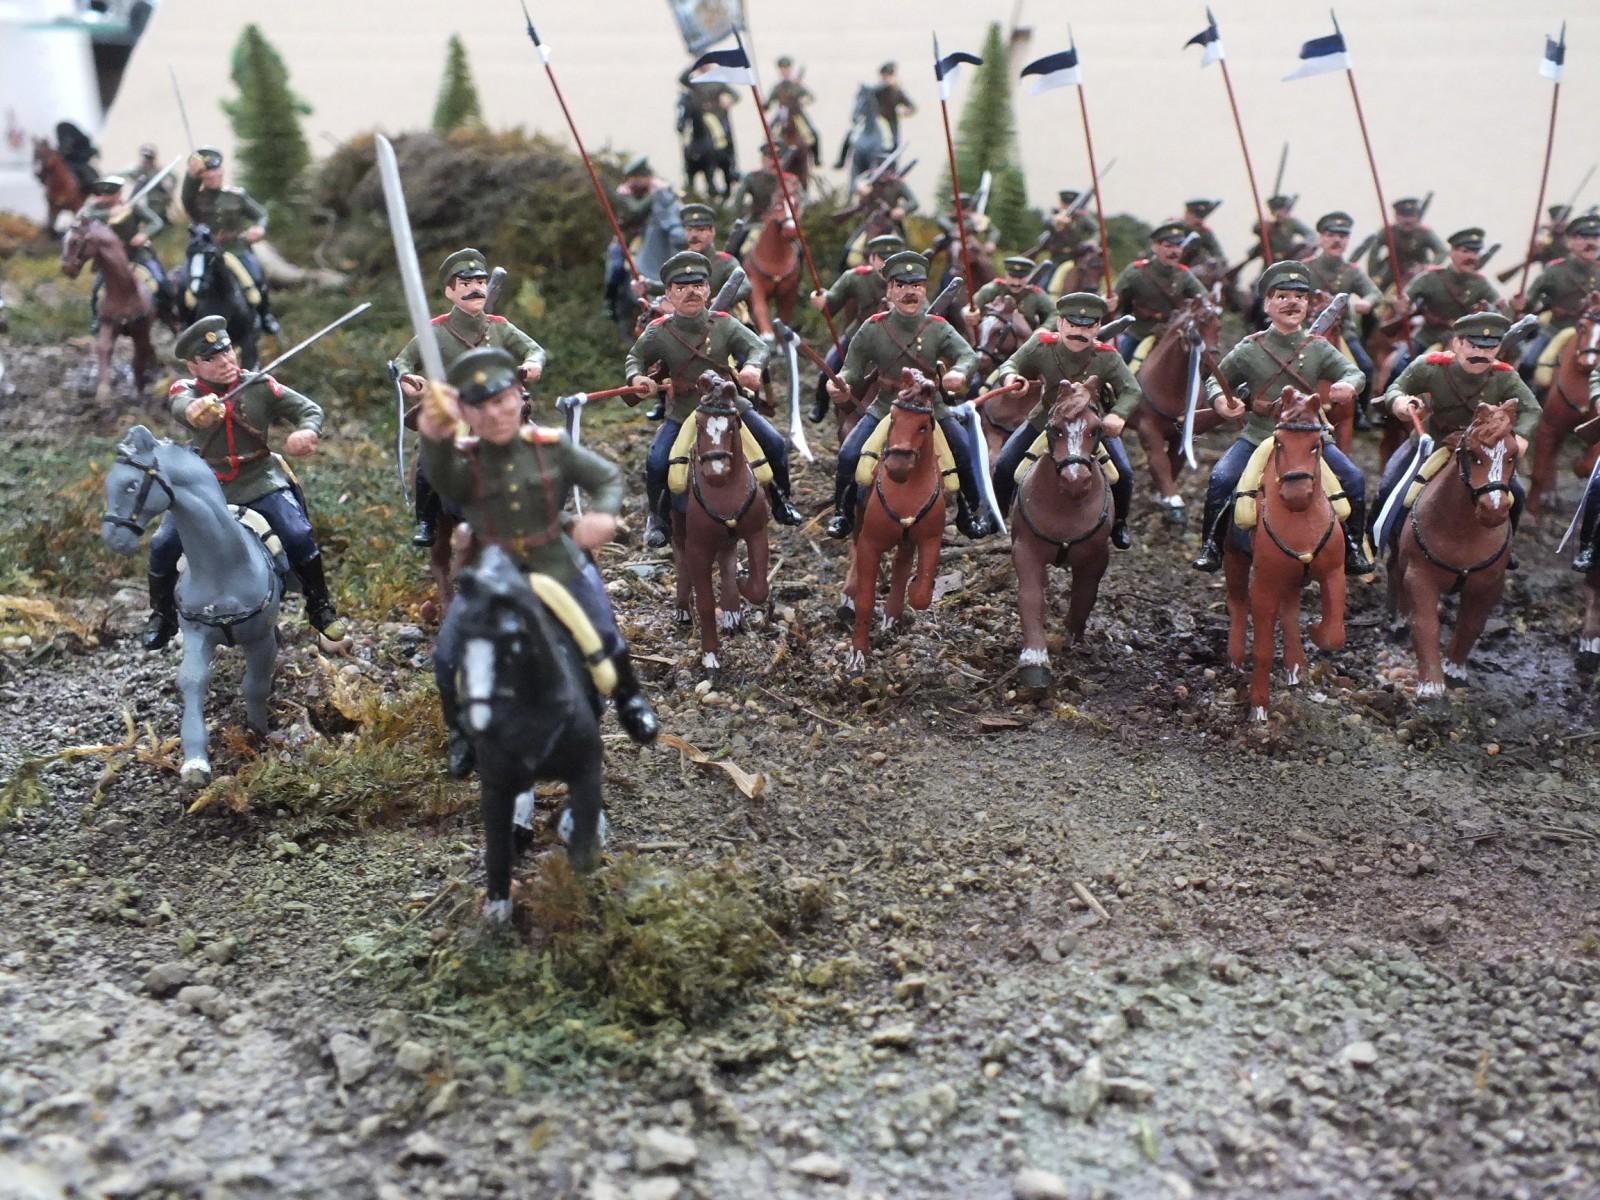 Атака  кавалерийского эскадрона РИА  в ПМВ DSCF0010(1)